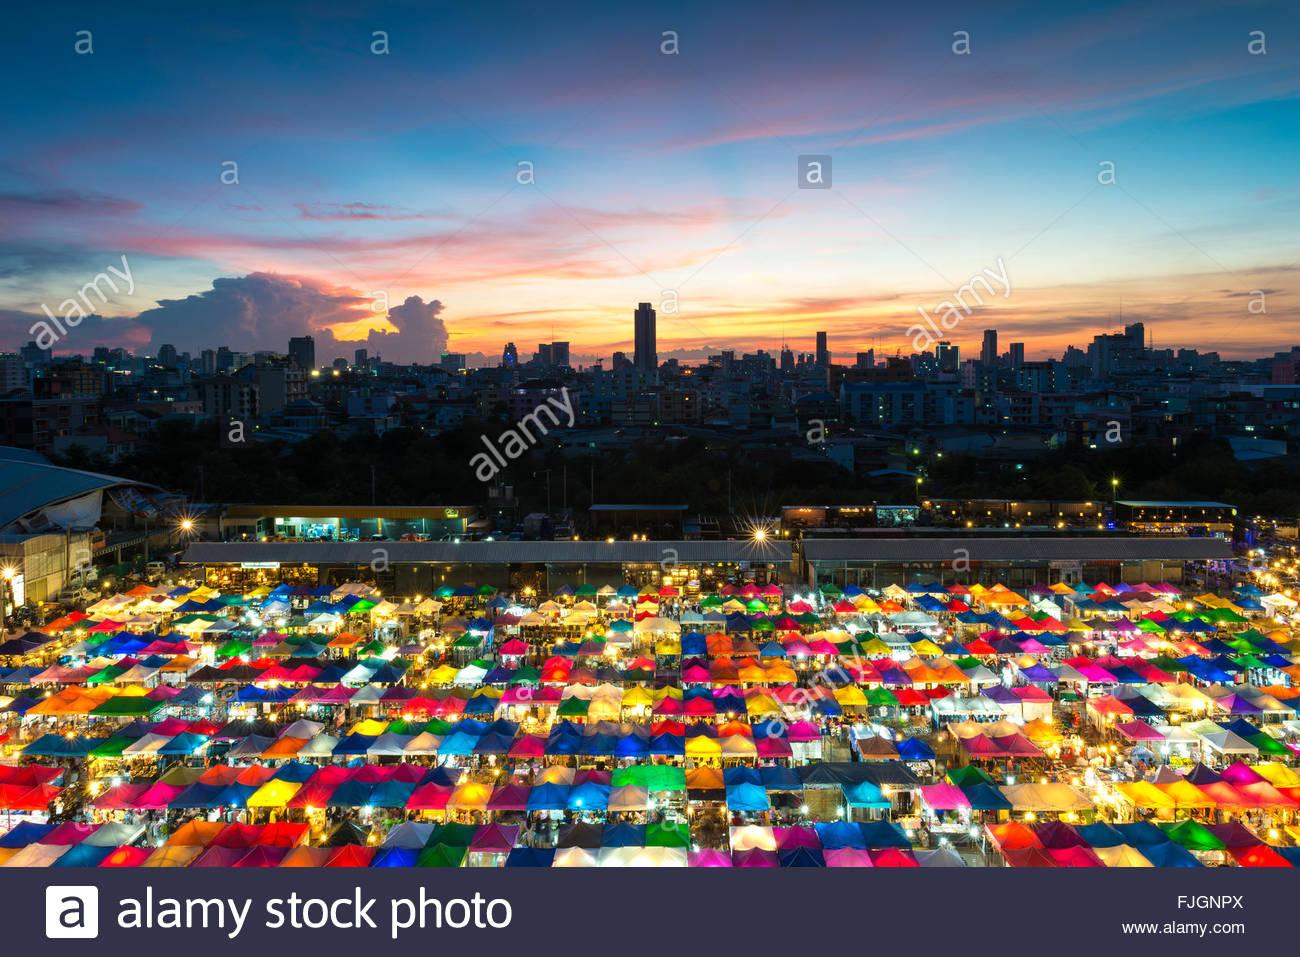 Bangkok night market - Stock Image